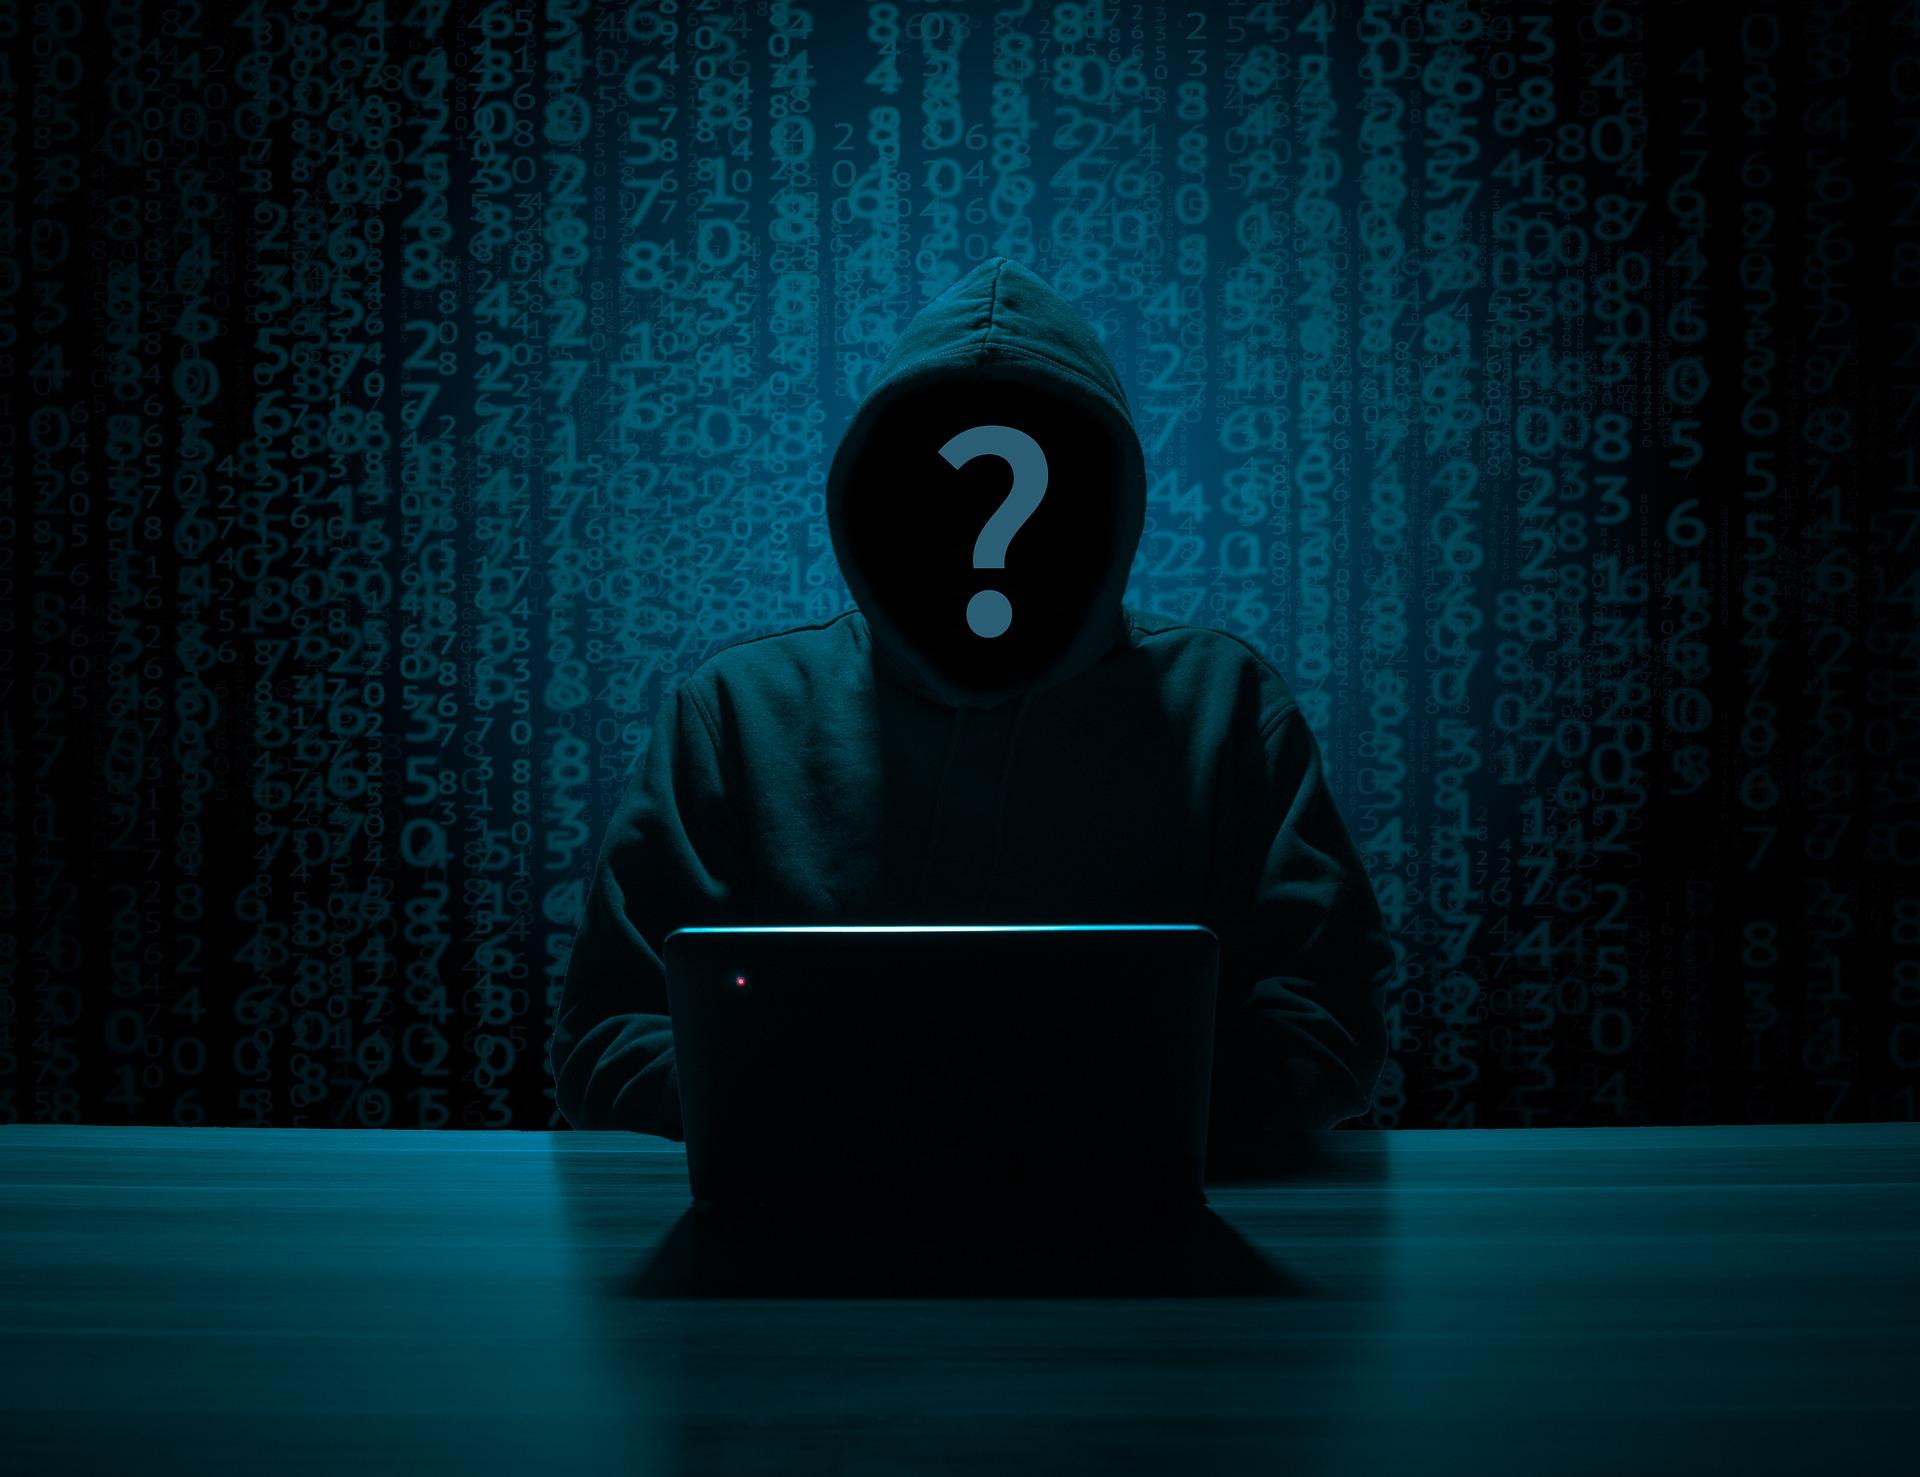 Hack protection hacker